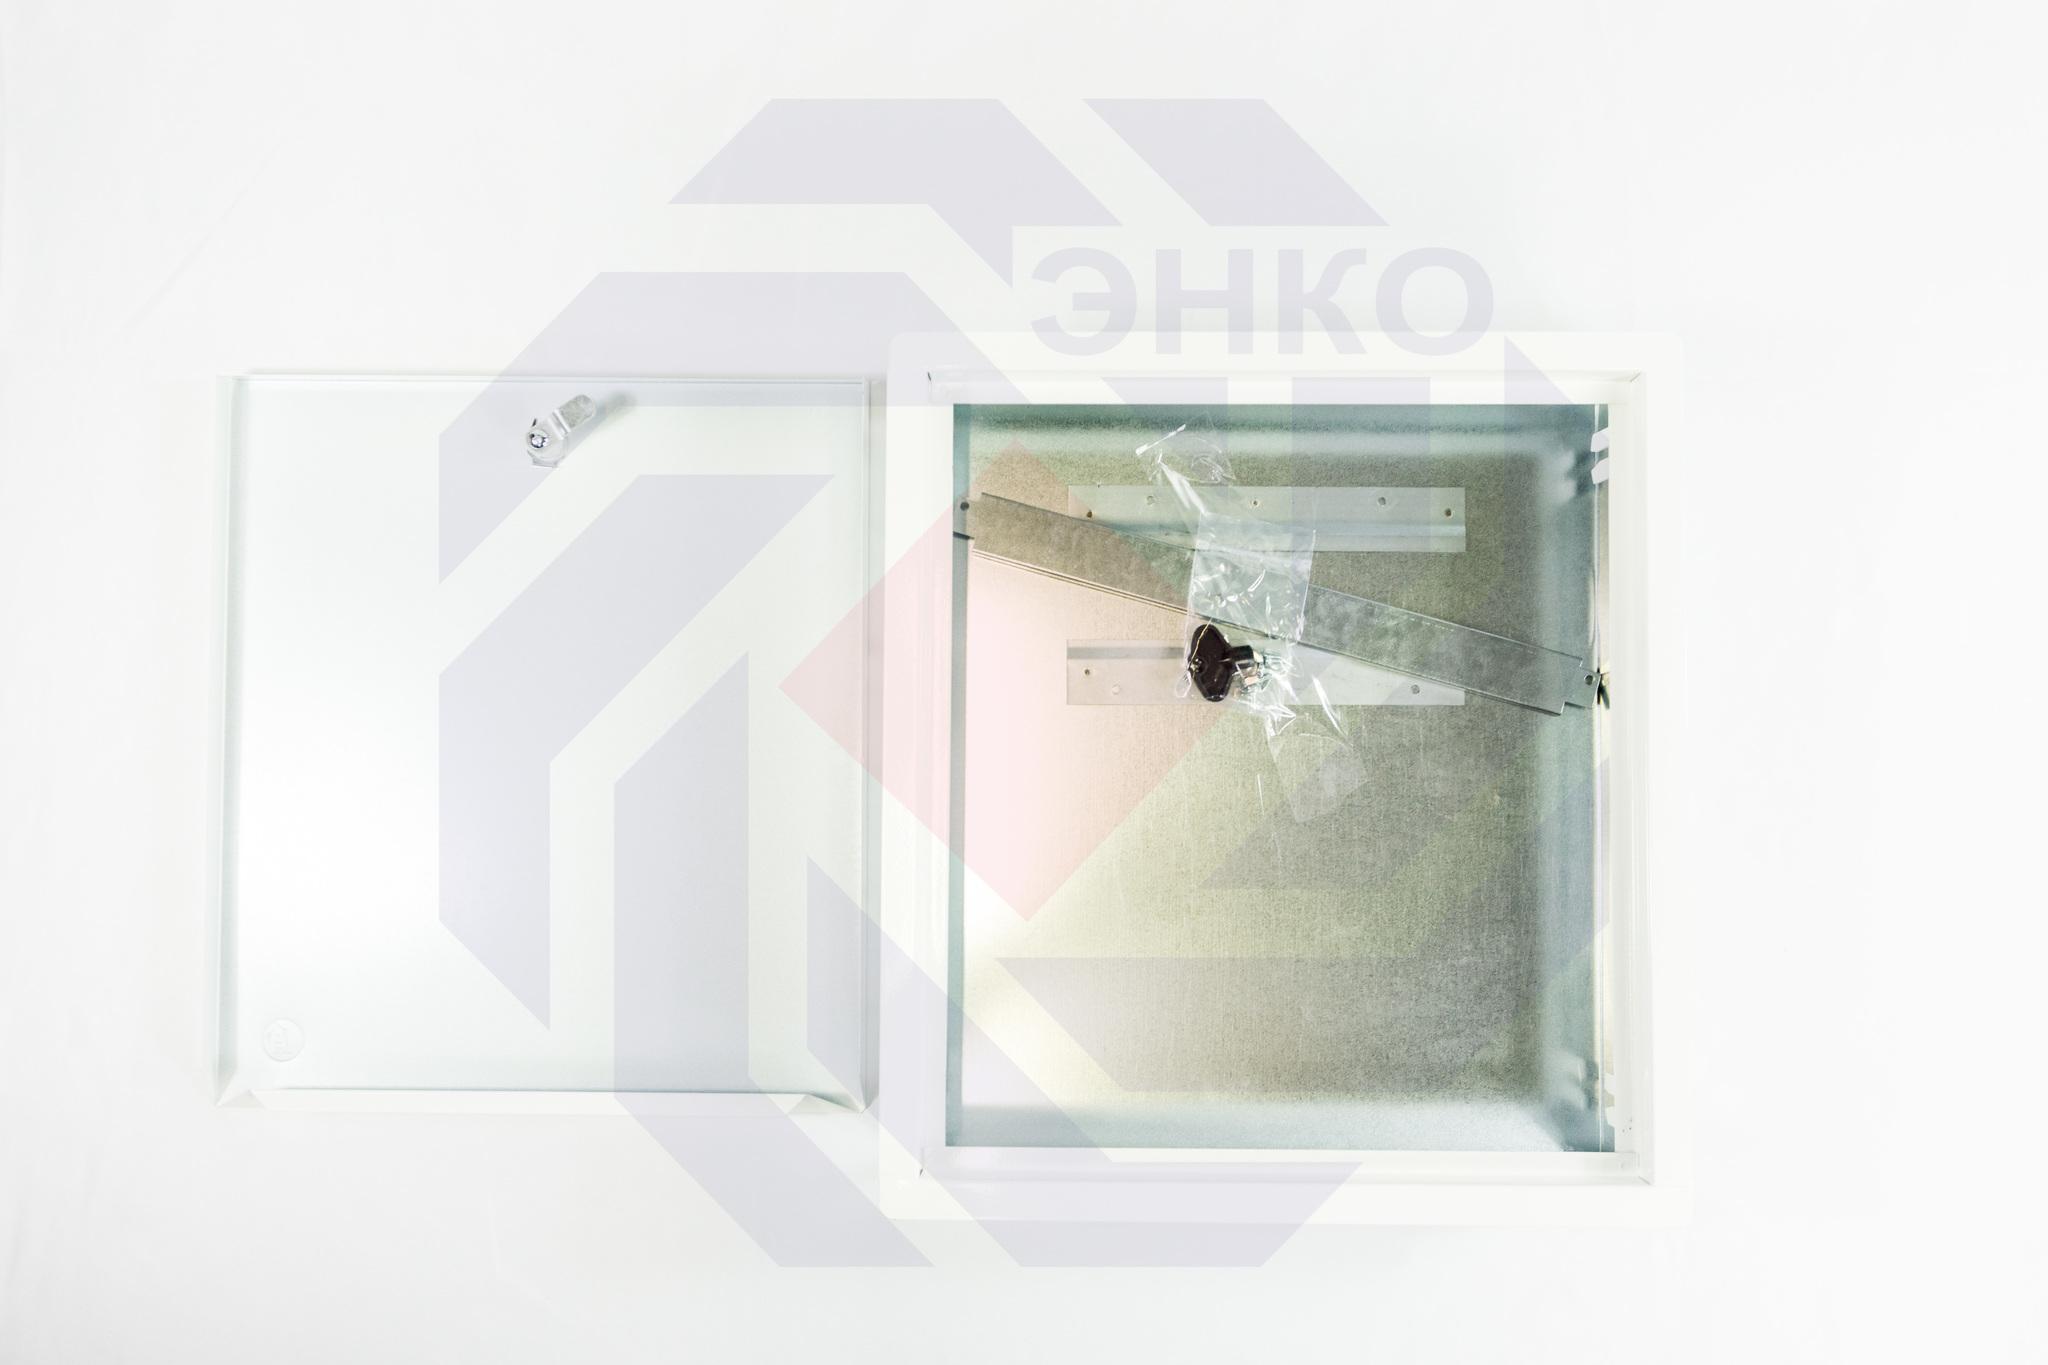 Шкаф для коллекторов GIACOMINI R500 1